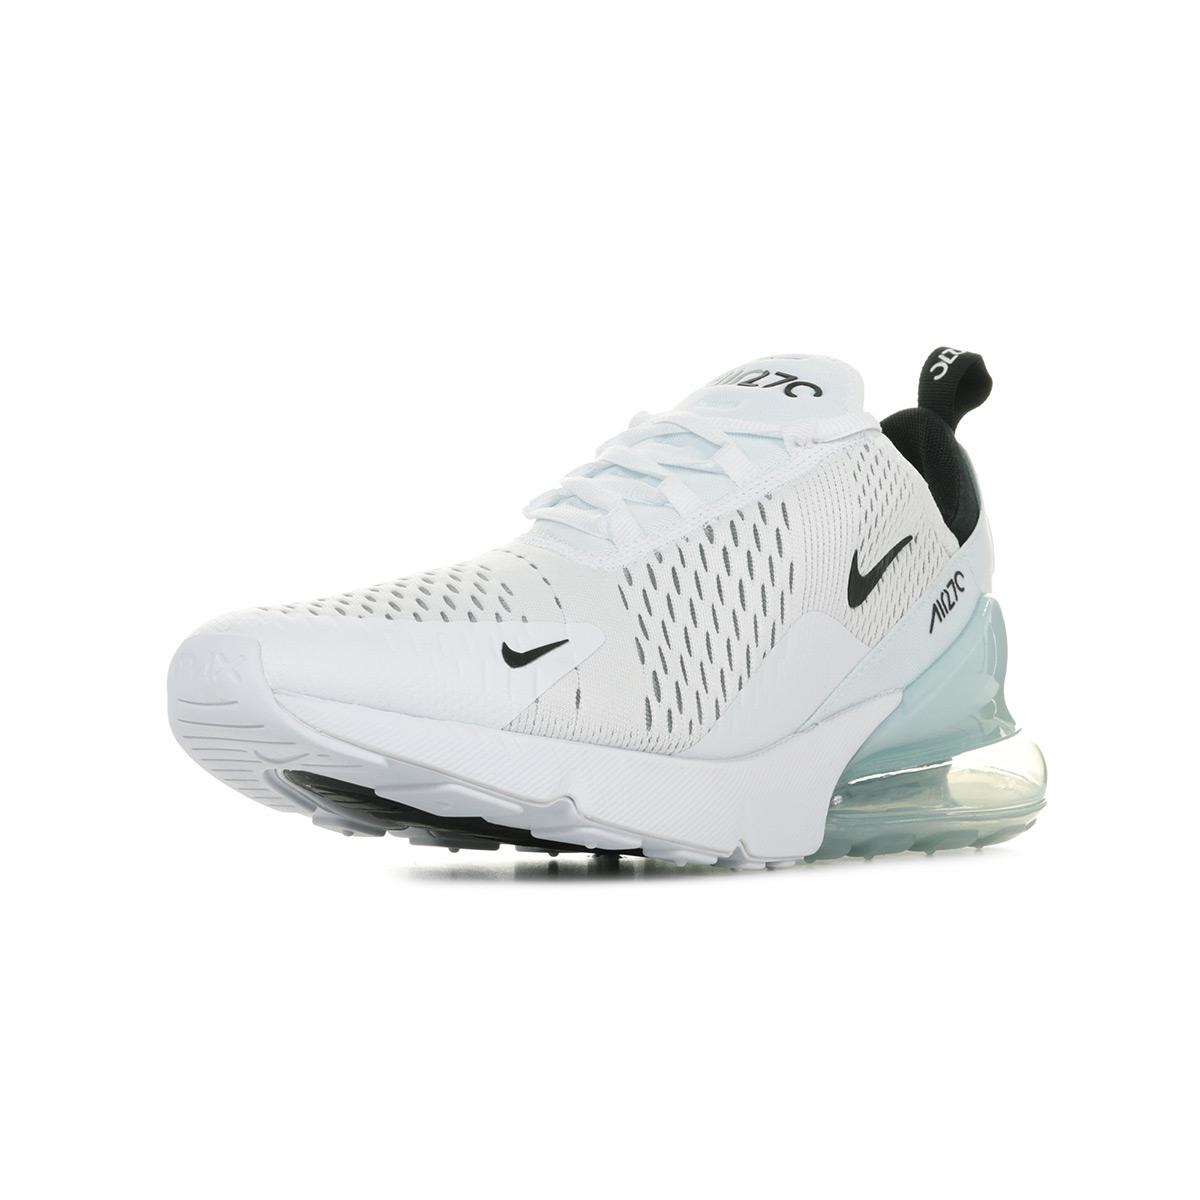 hot sale online d069d 13ca2 Nike Air Max 270 ...